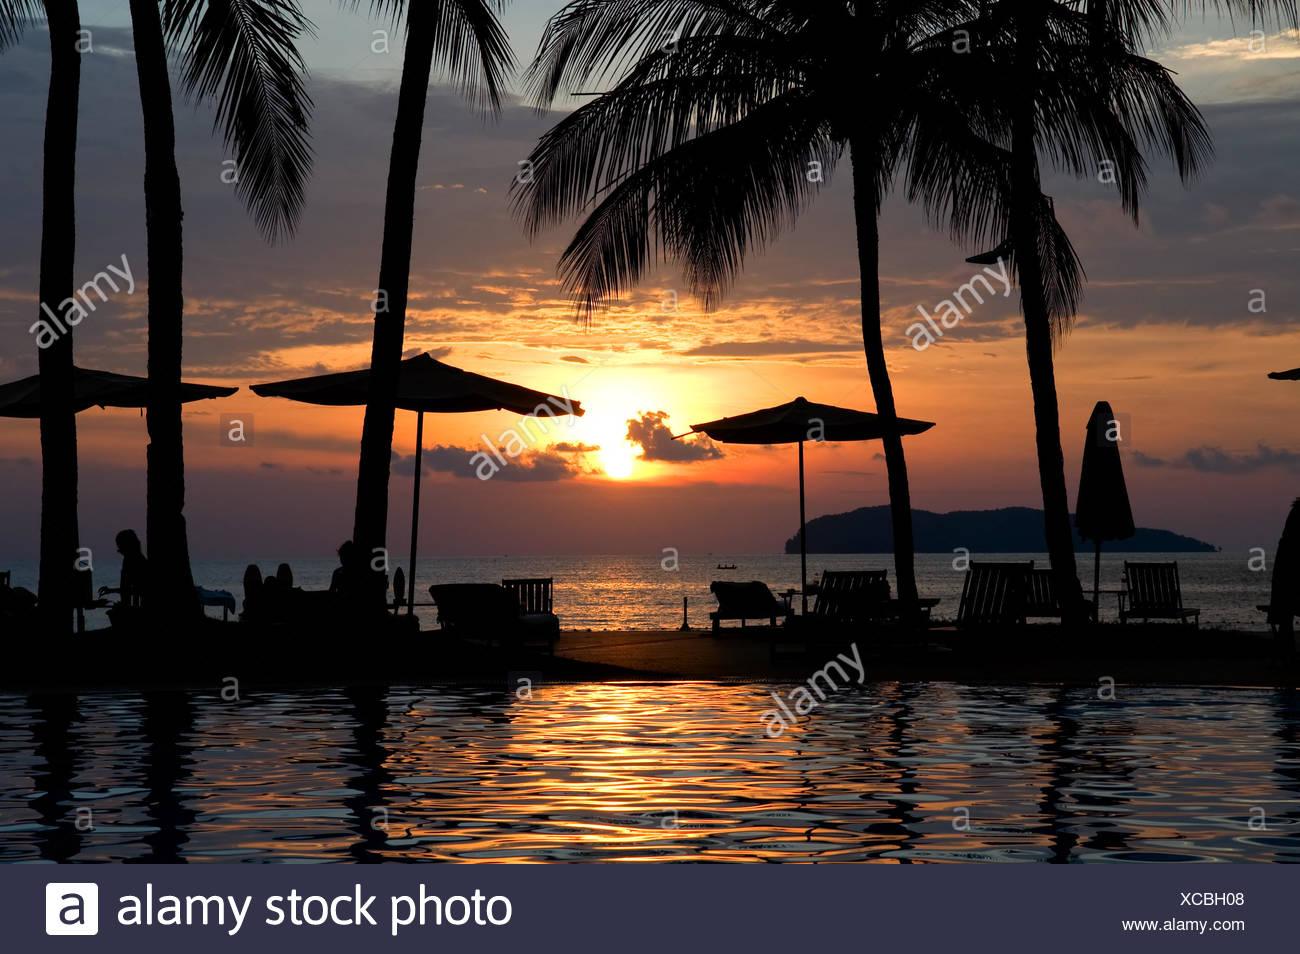 Tree Sunset Reflection Silhouette Palm Resort Shine Shines